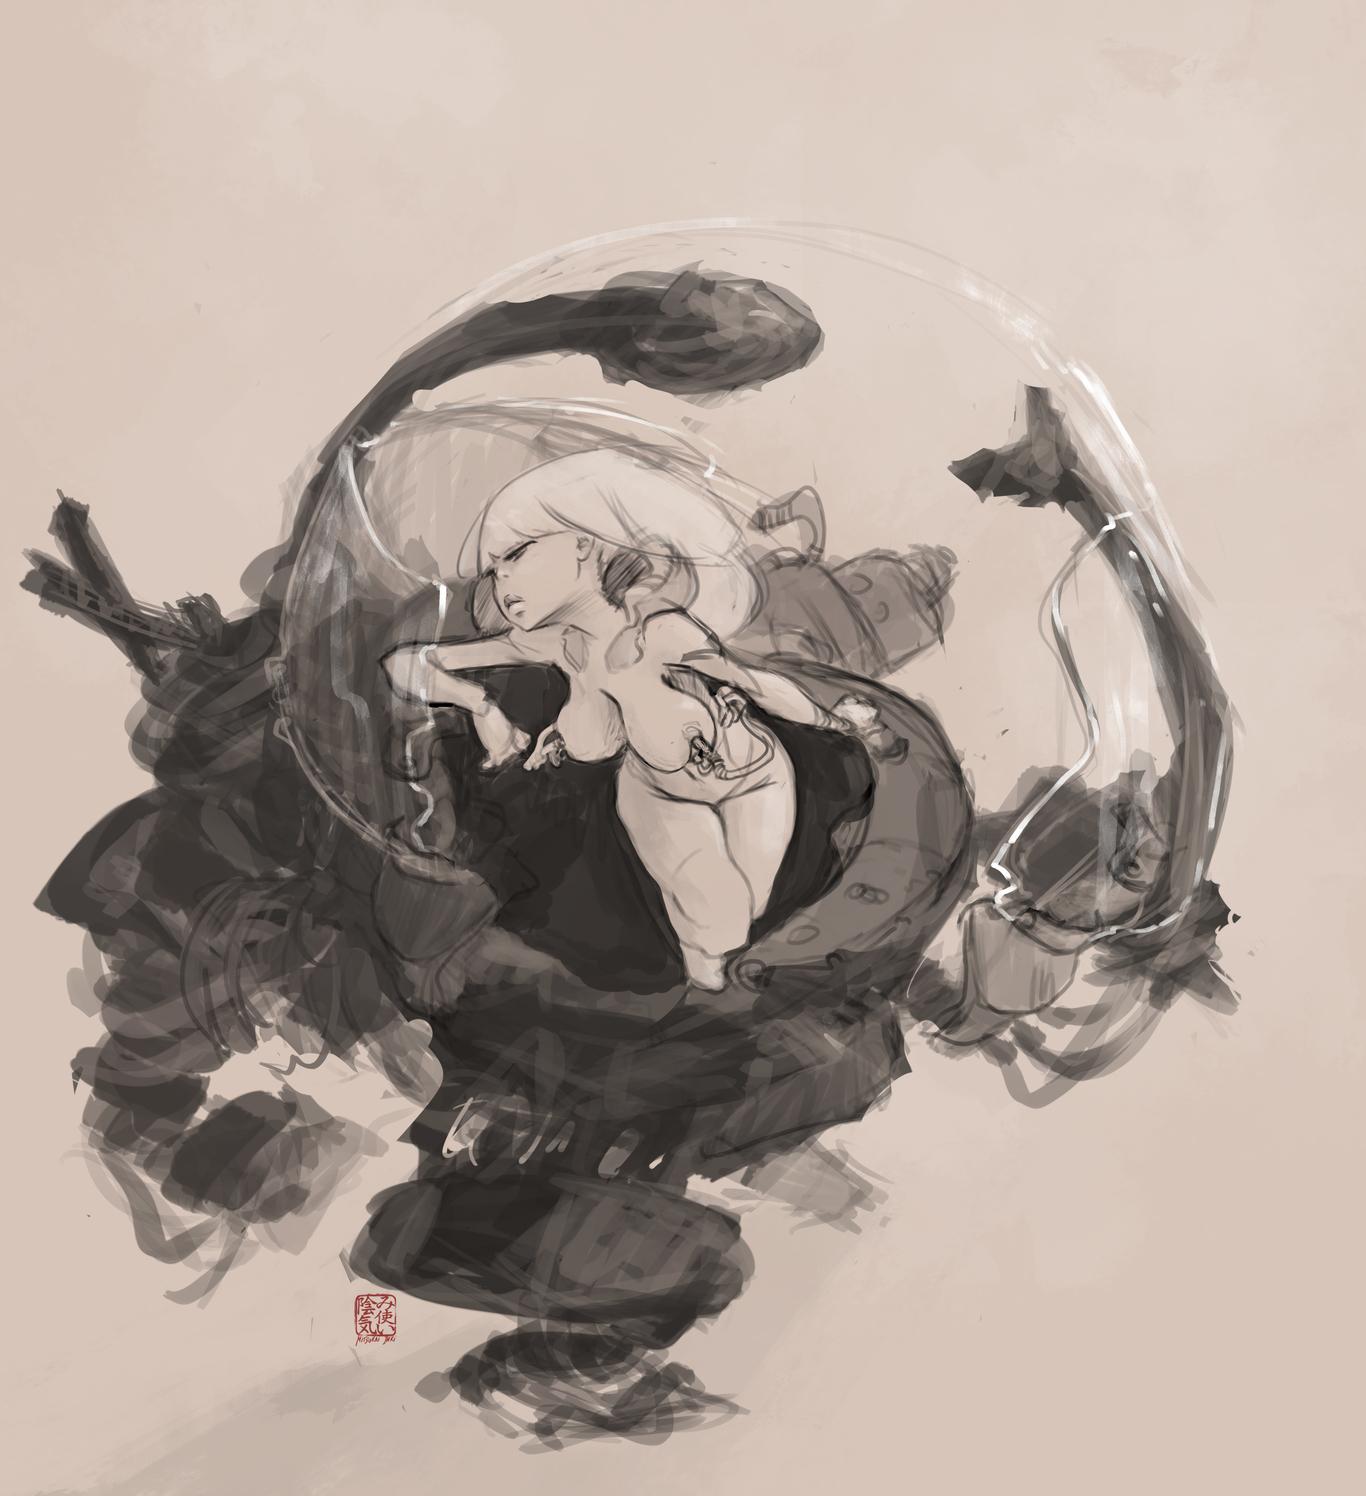 Mitsukai inki doodle mecha girl 1 5f0f1302 j8q2